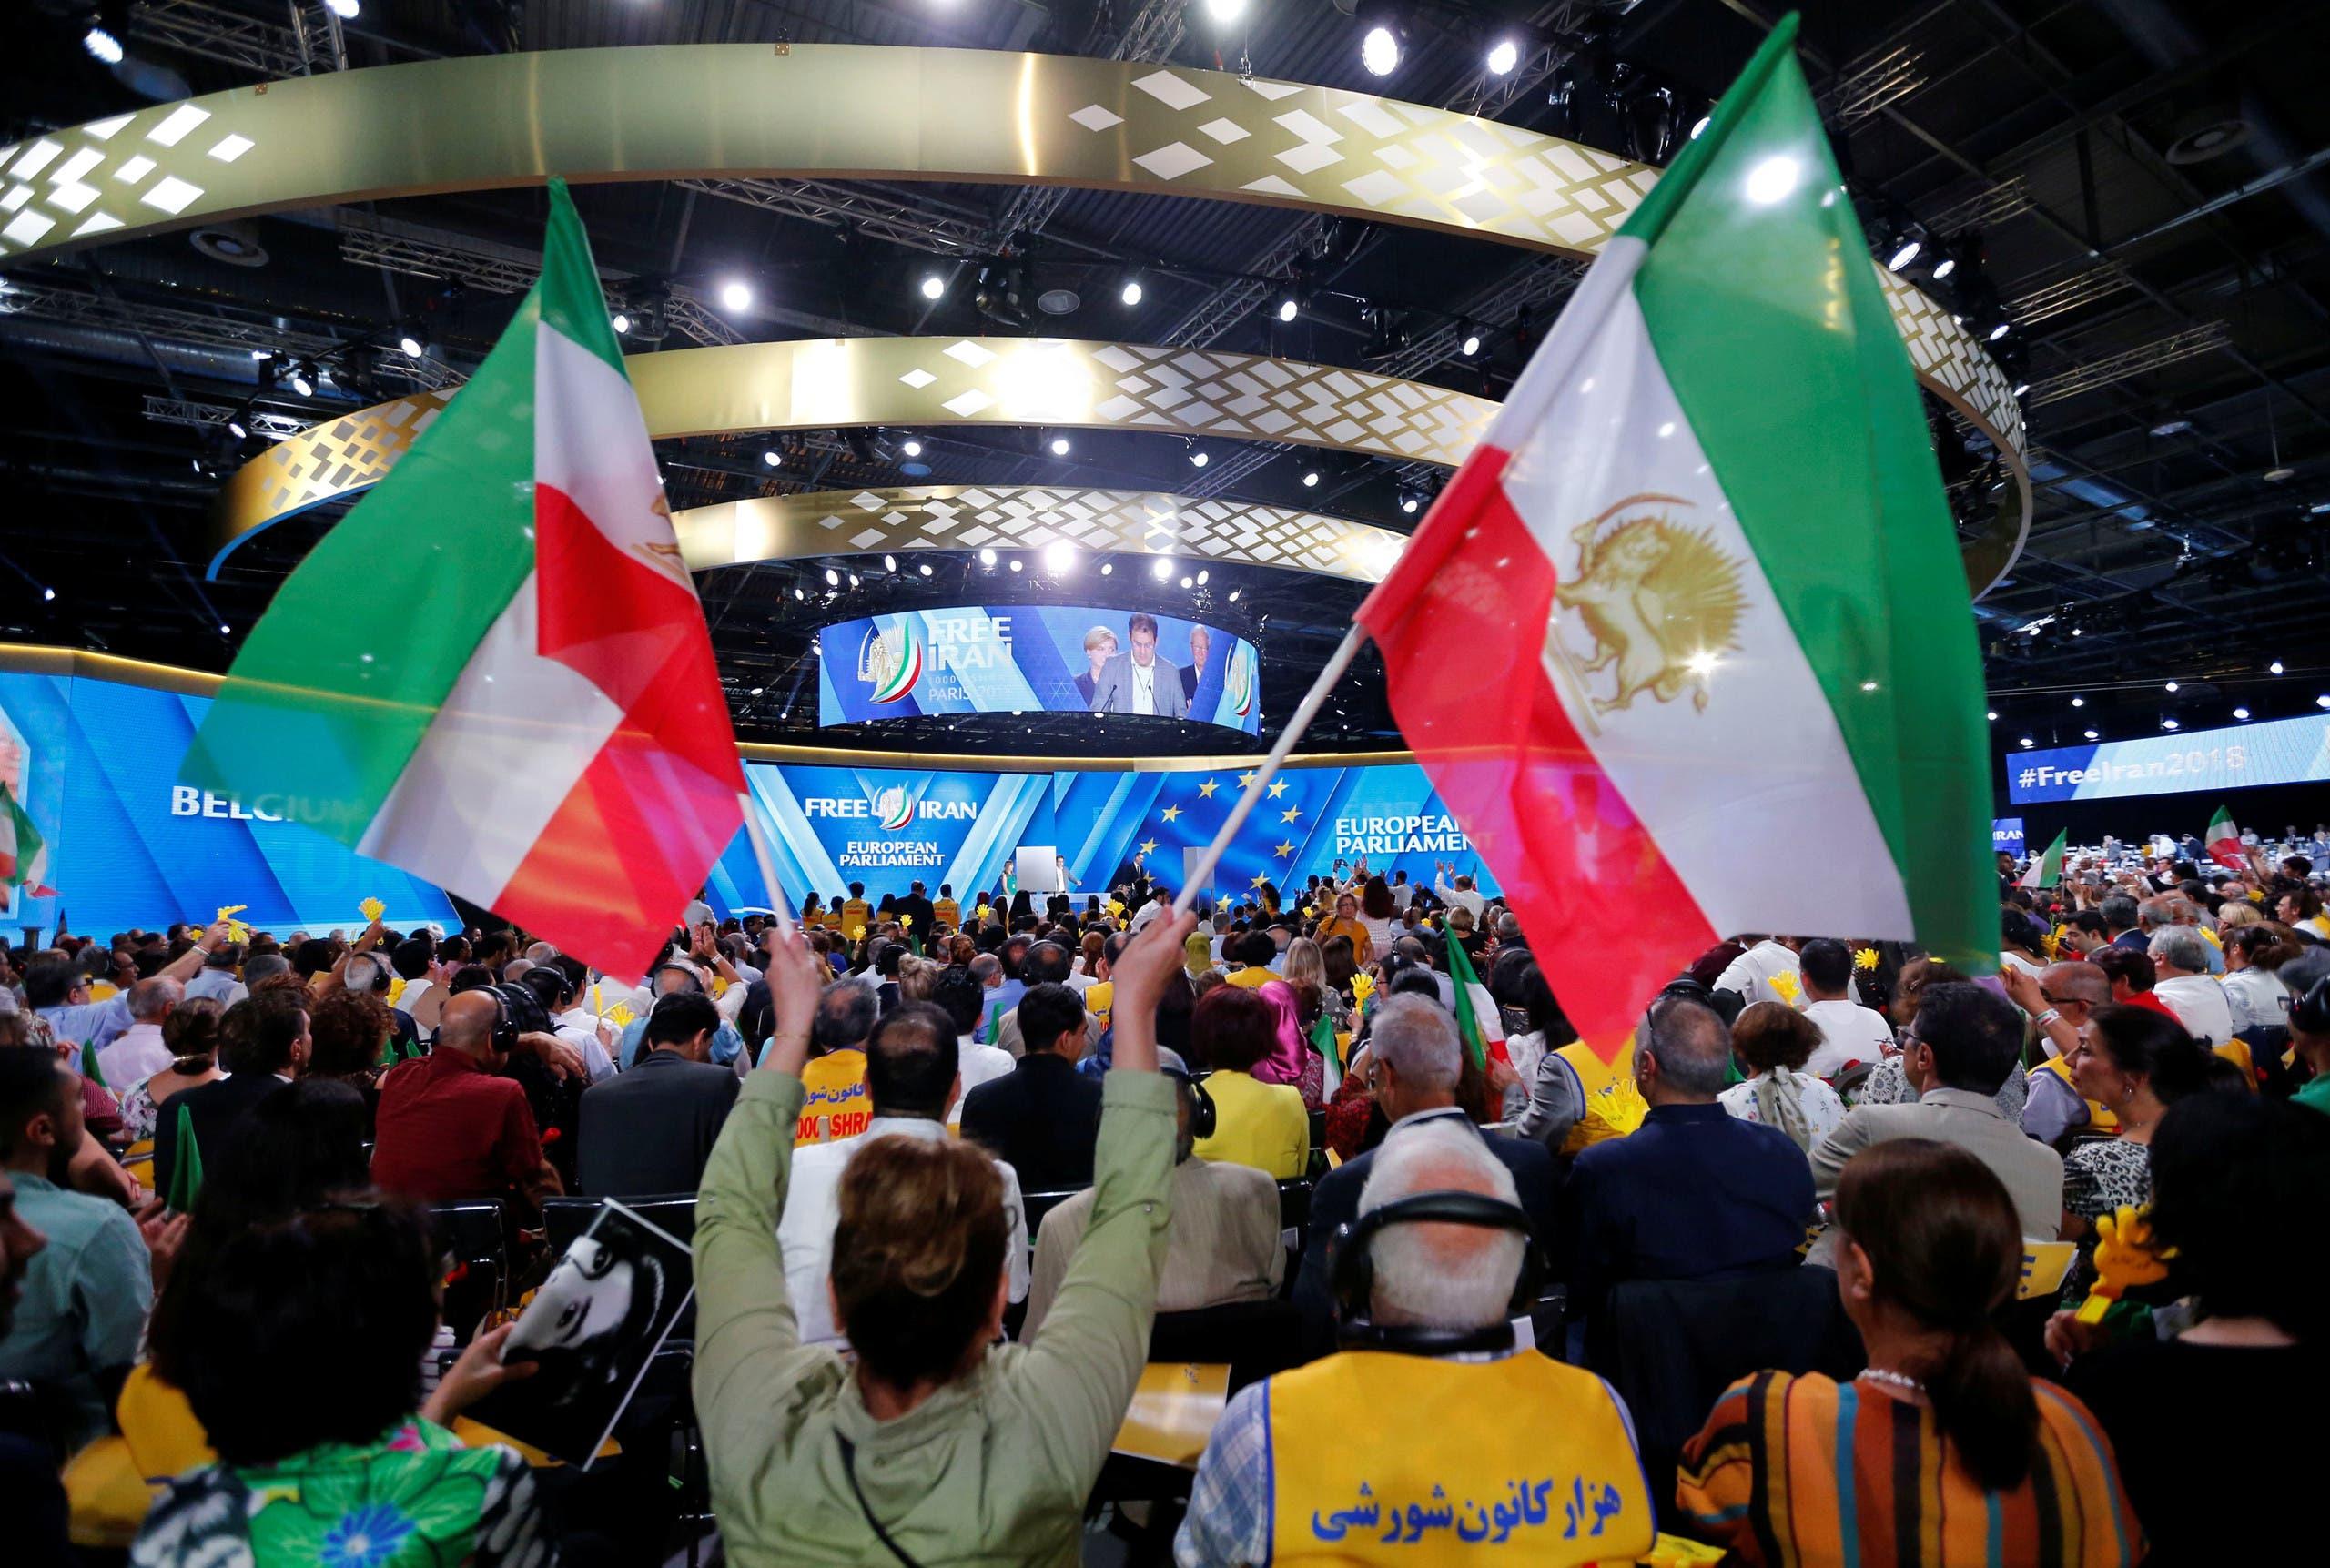 FREE IRAN PARIS